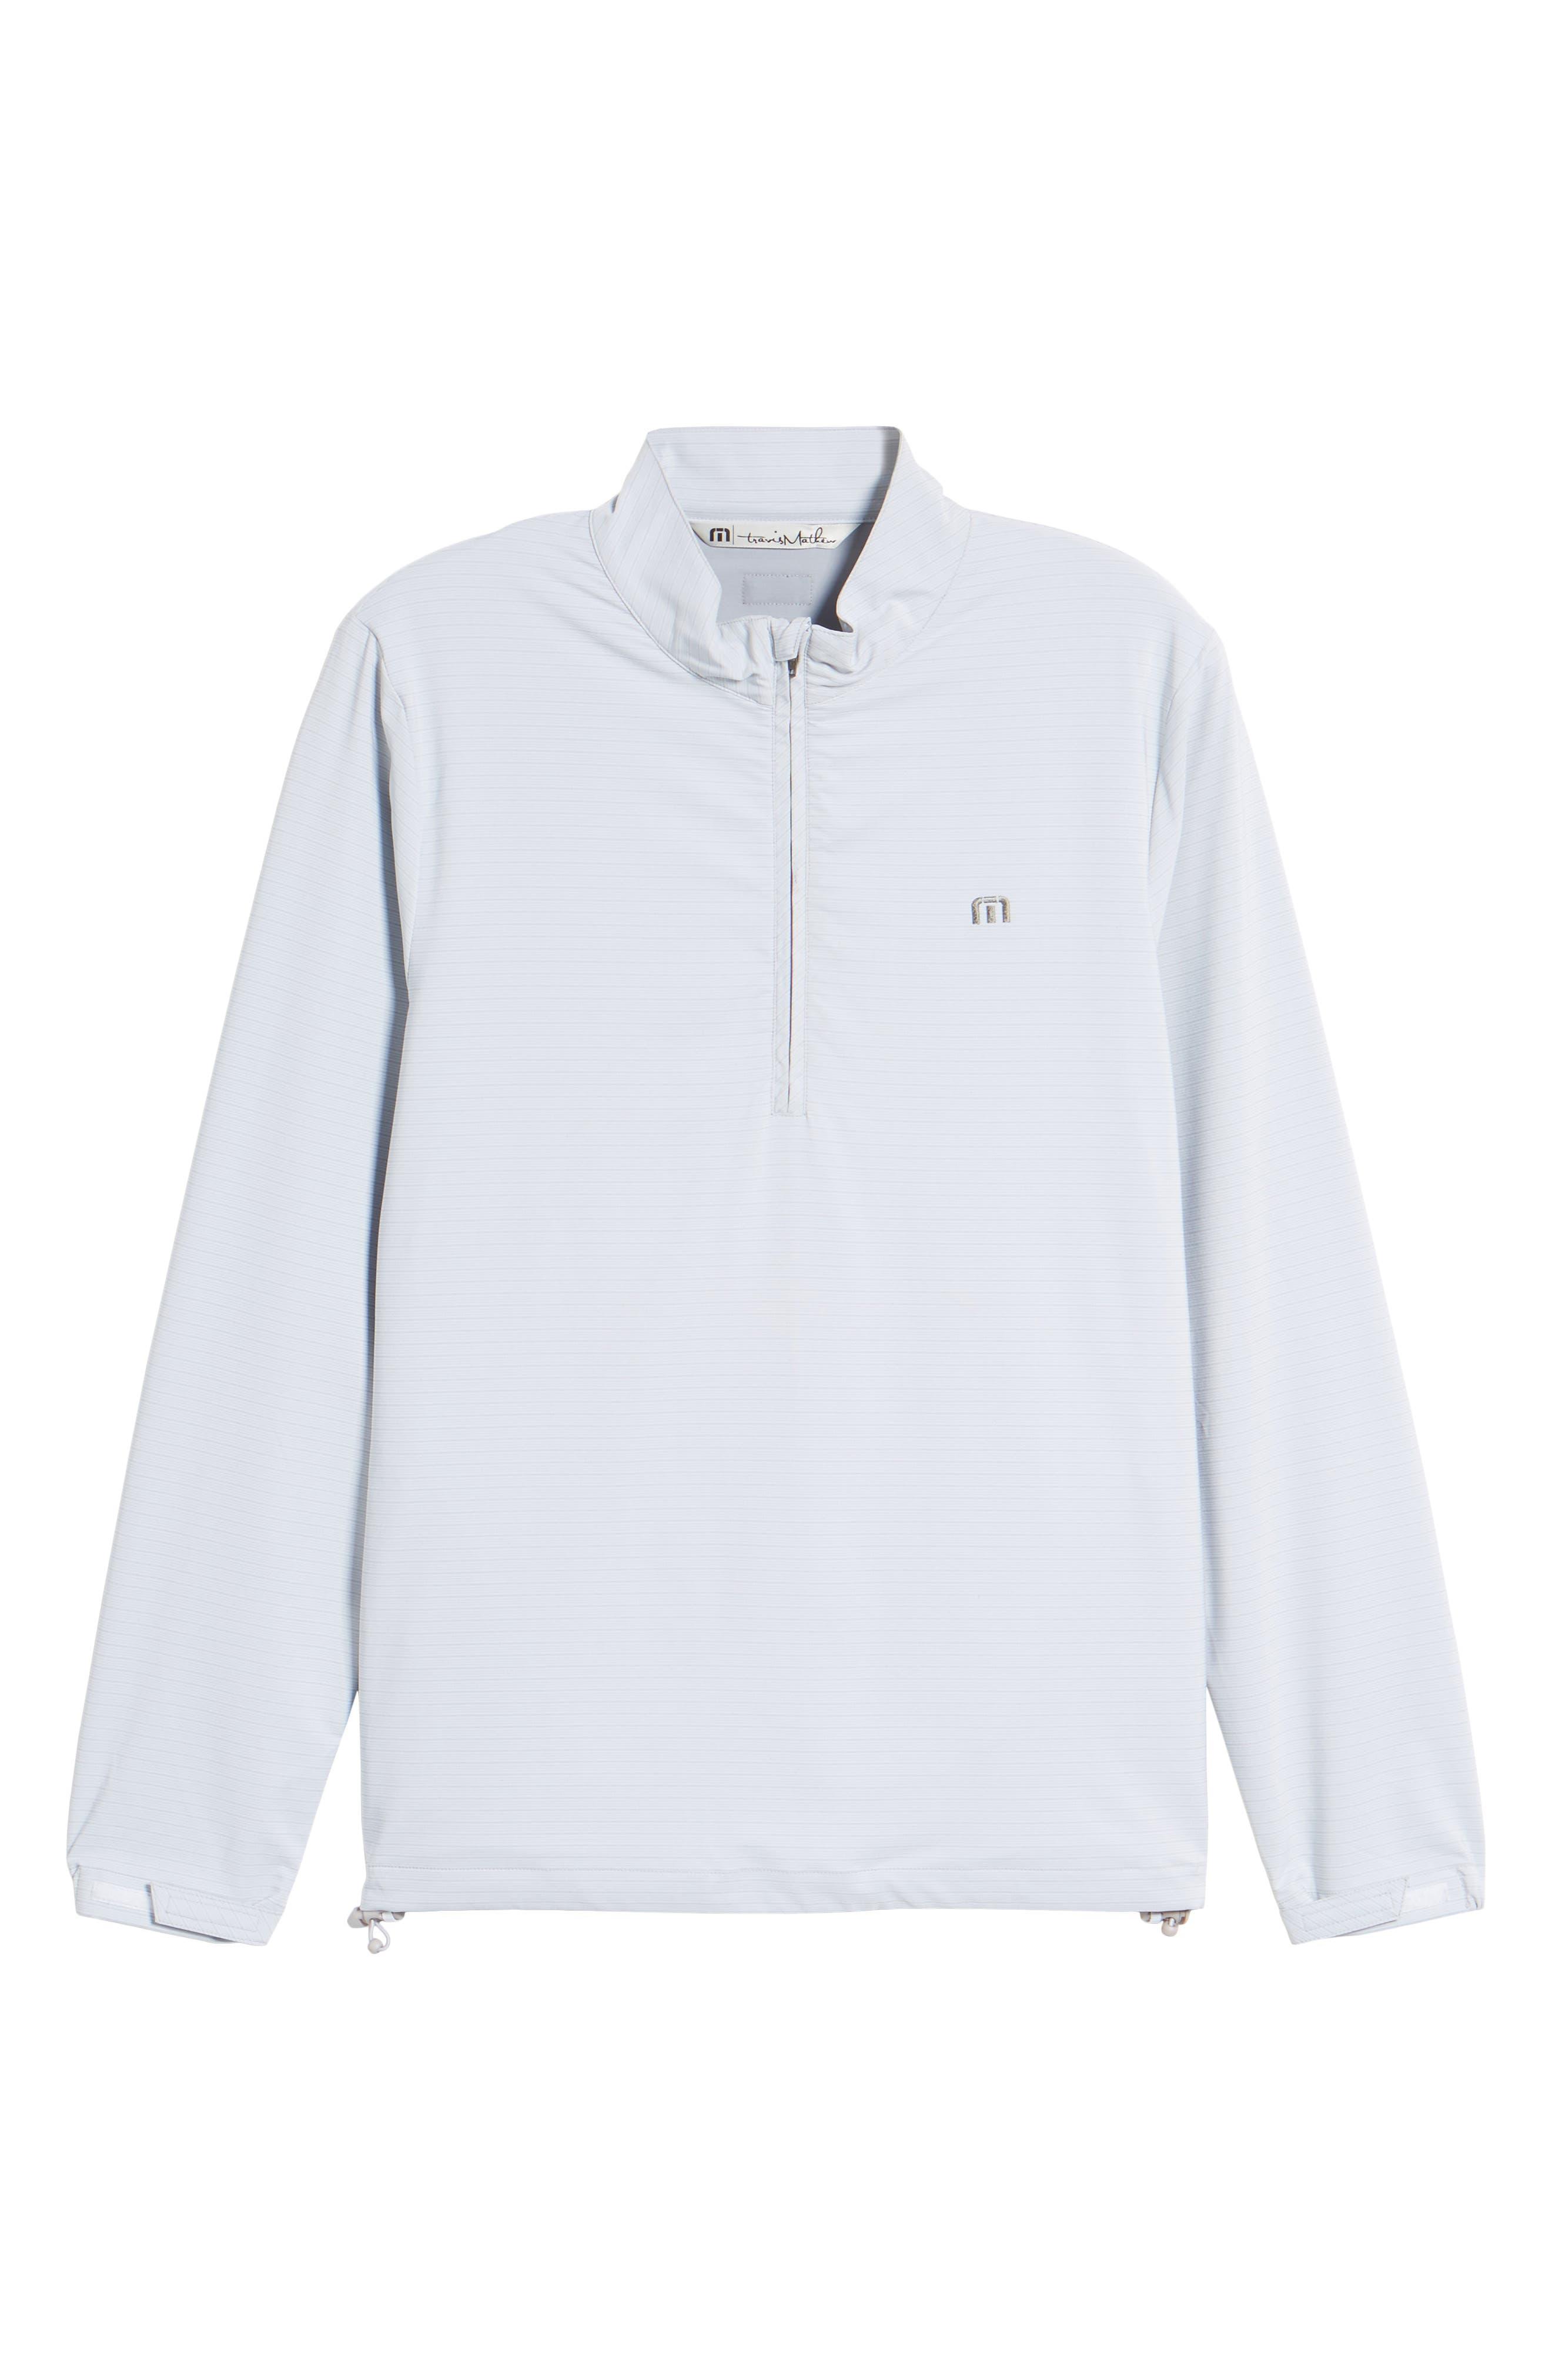 Luca Quarter Zip Pullover,                             Alternate thumbnail 6, color,                             Micro Chip/ White